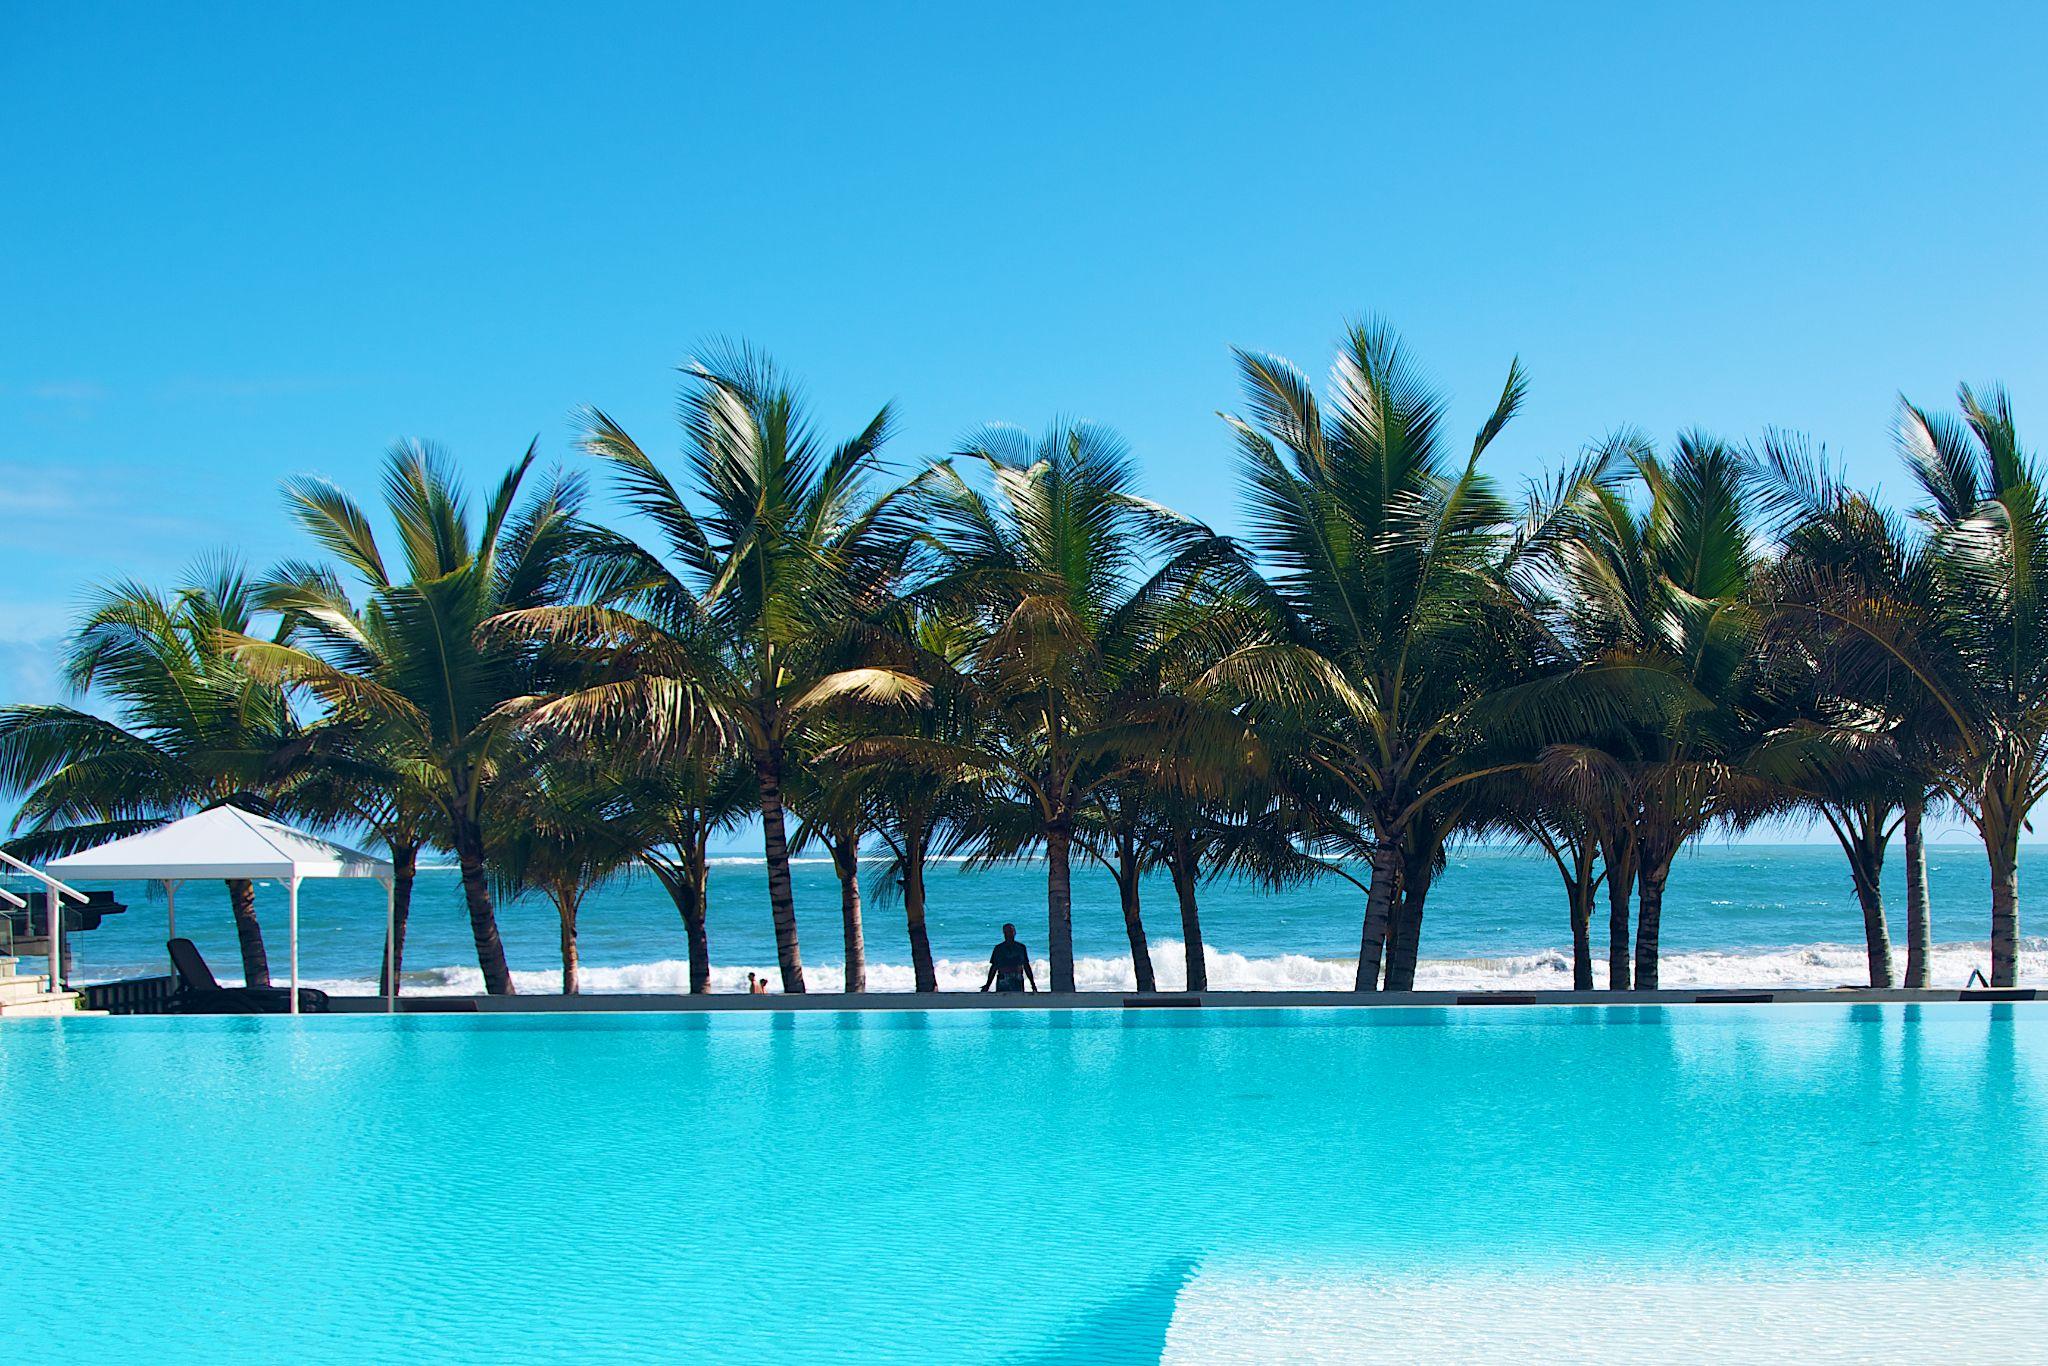 St Croix Virgin Islands Beaches